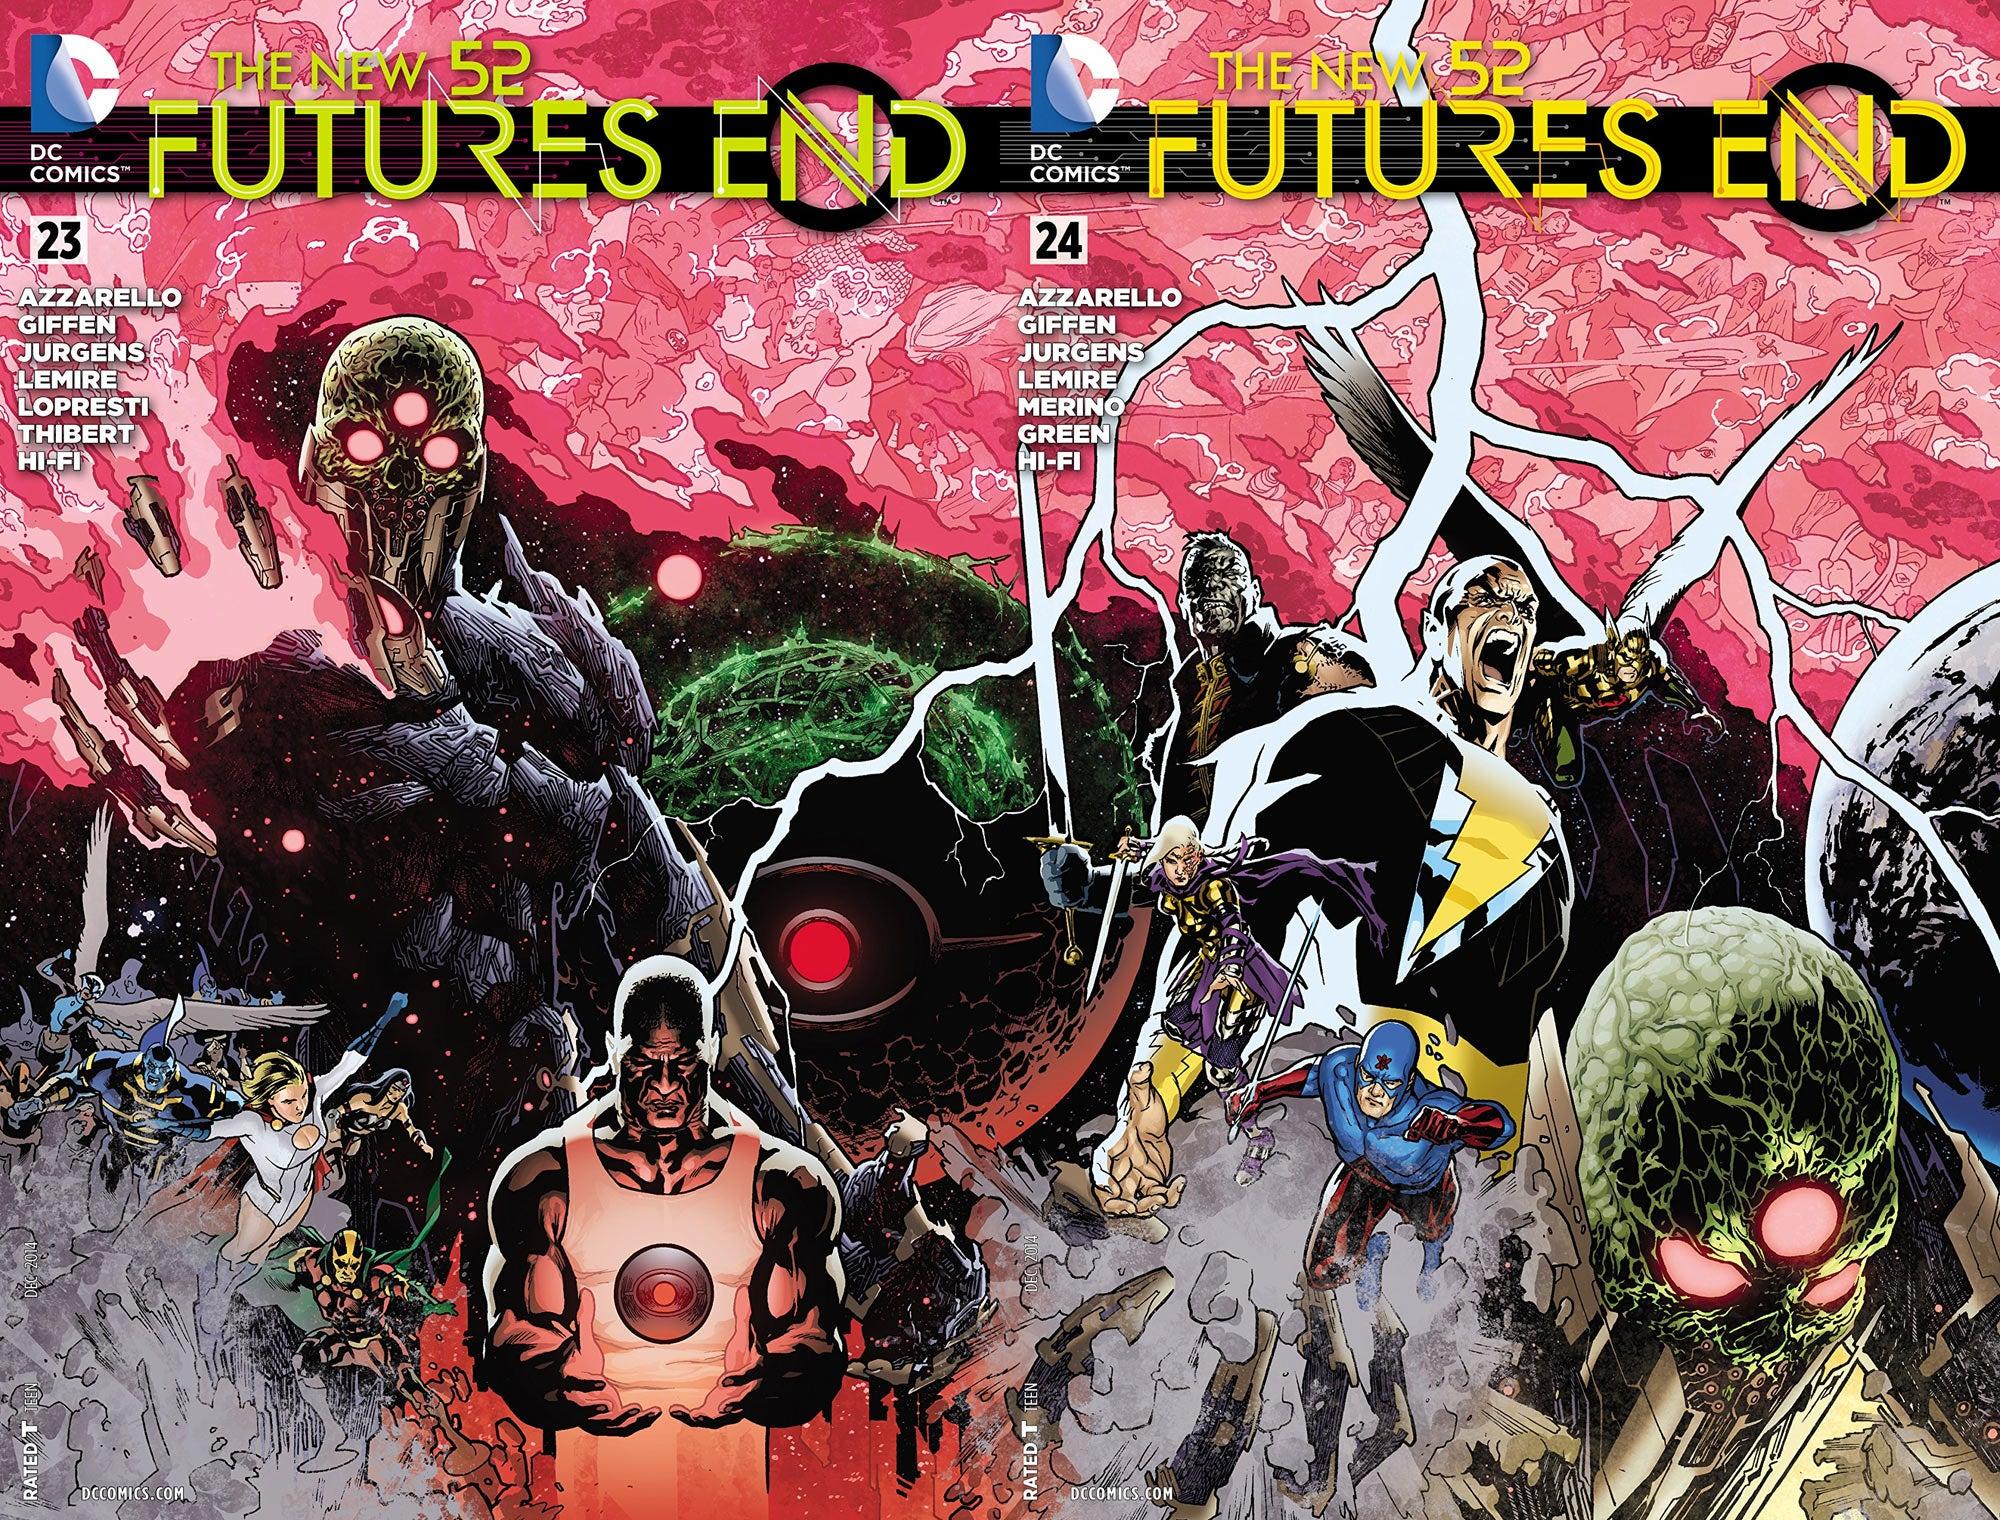 http://media.comicbook.com/uploads1/2014/10/futures-end-top-108499.jpg